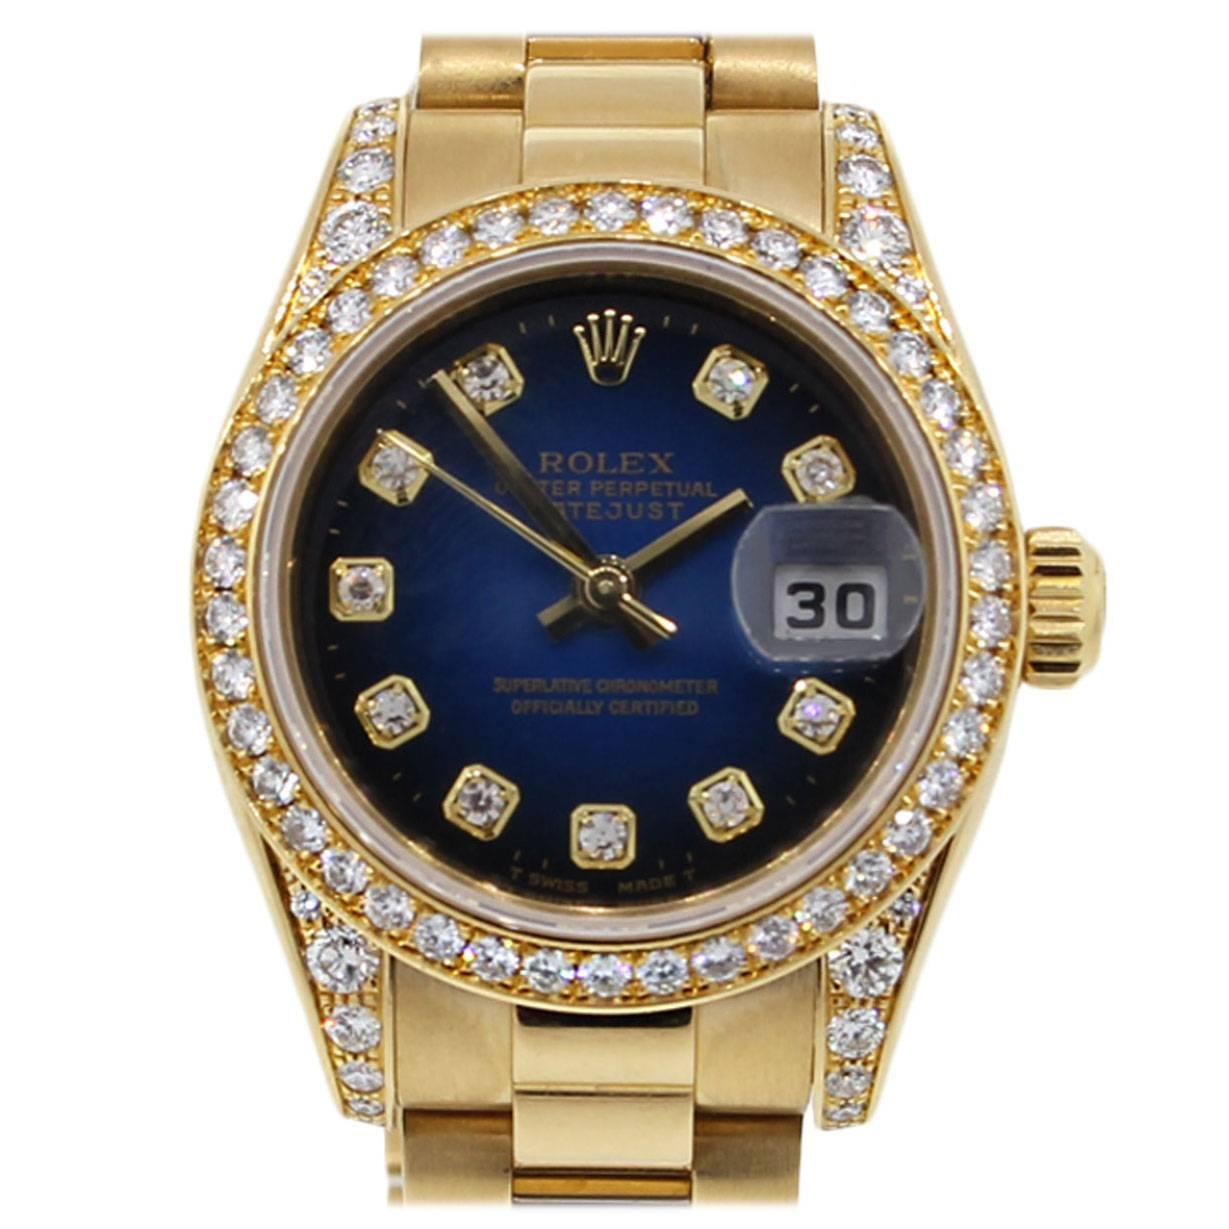 Rolex Lady's Yellow Gold Diamond Dial Datejust Presidential Automatic Wristwatch